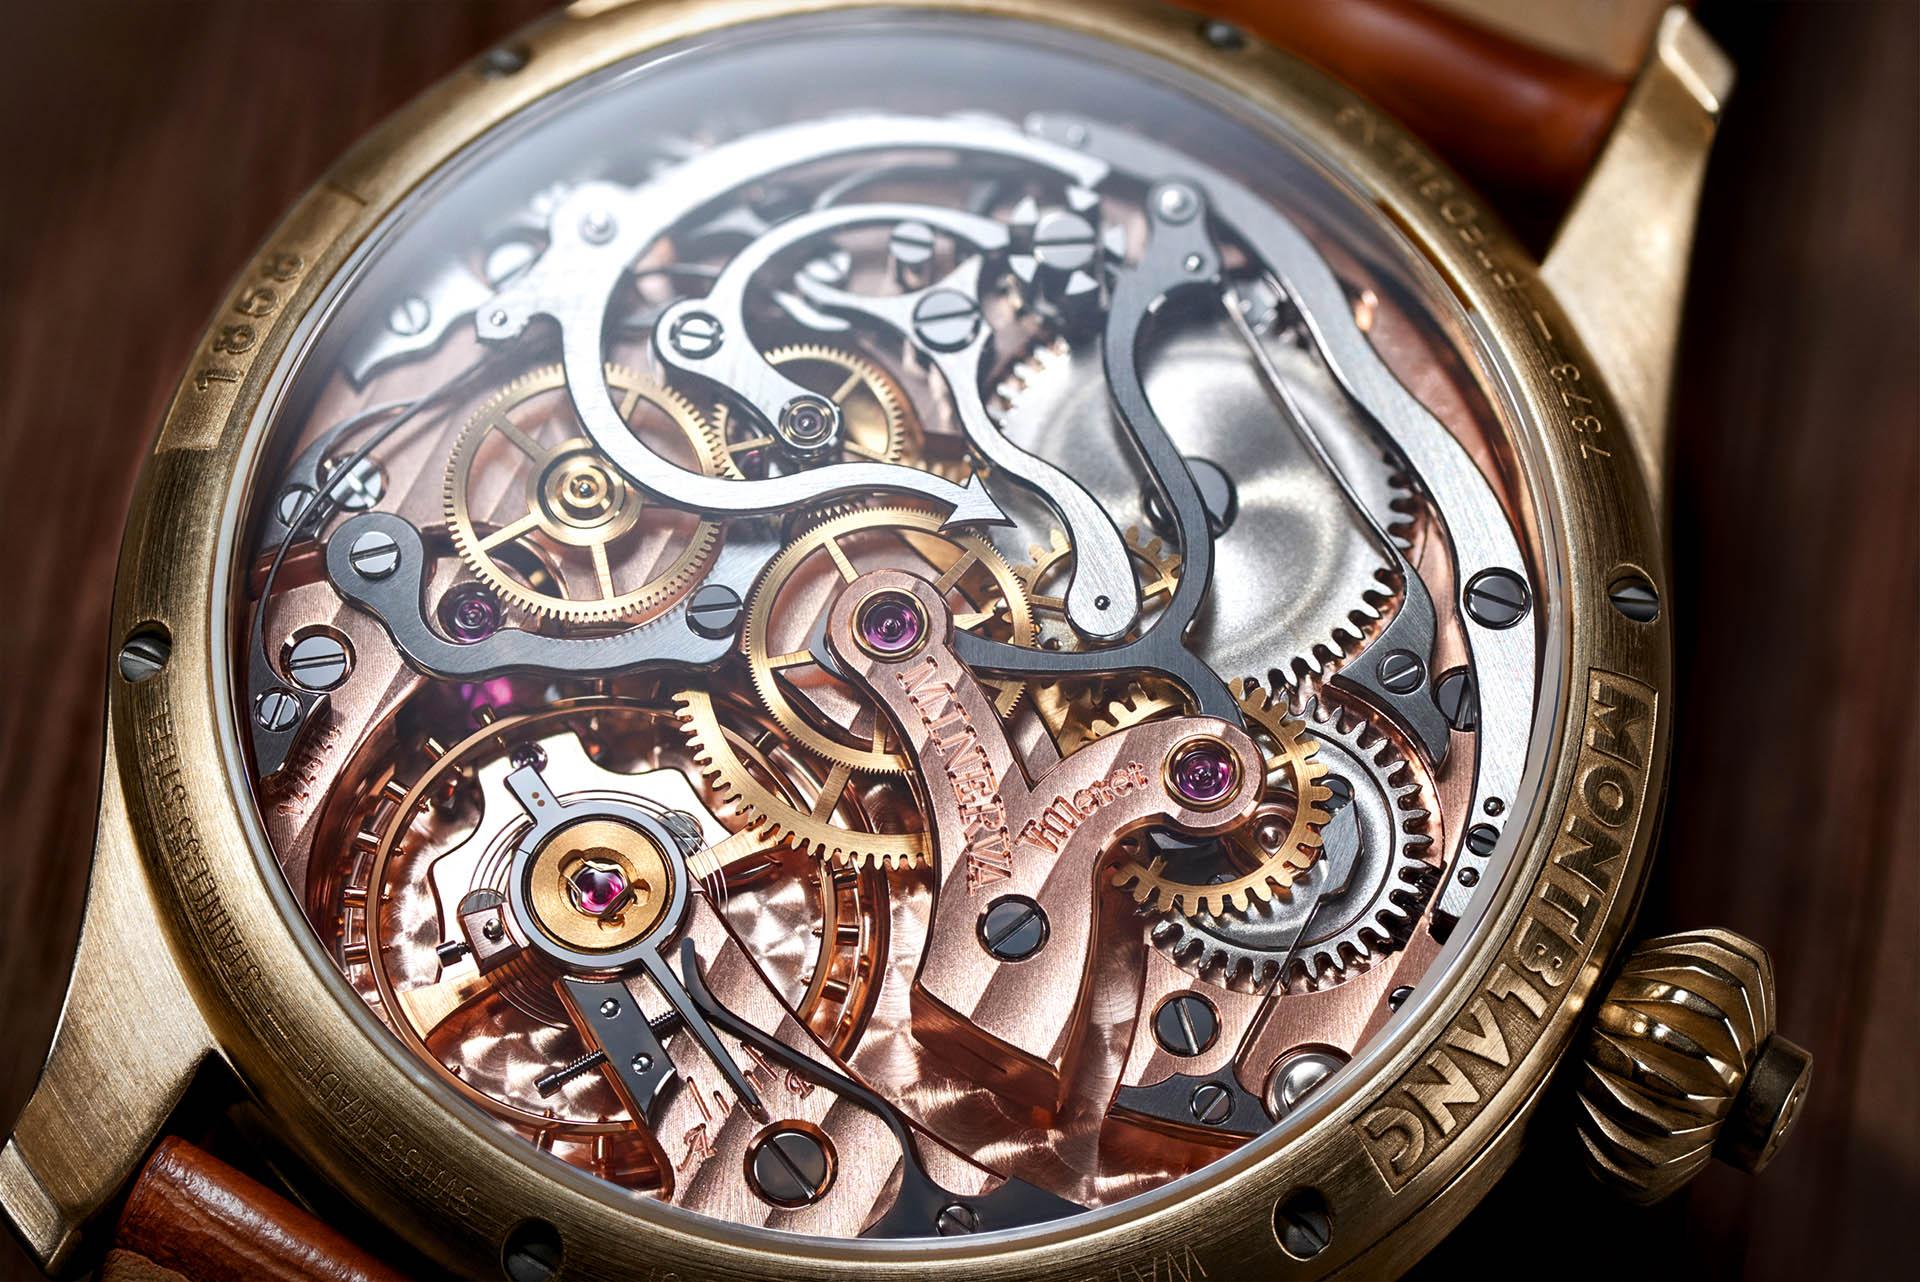 Montblanc 1858 Chronograph Tachymeter